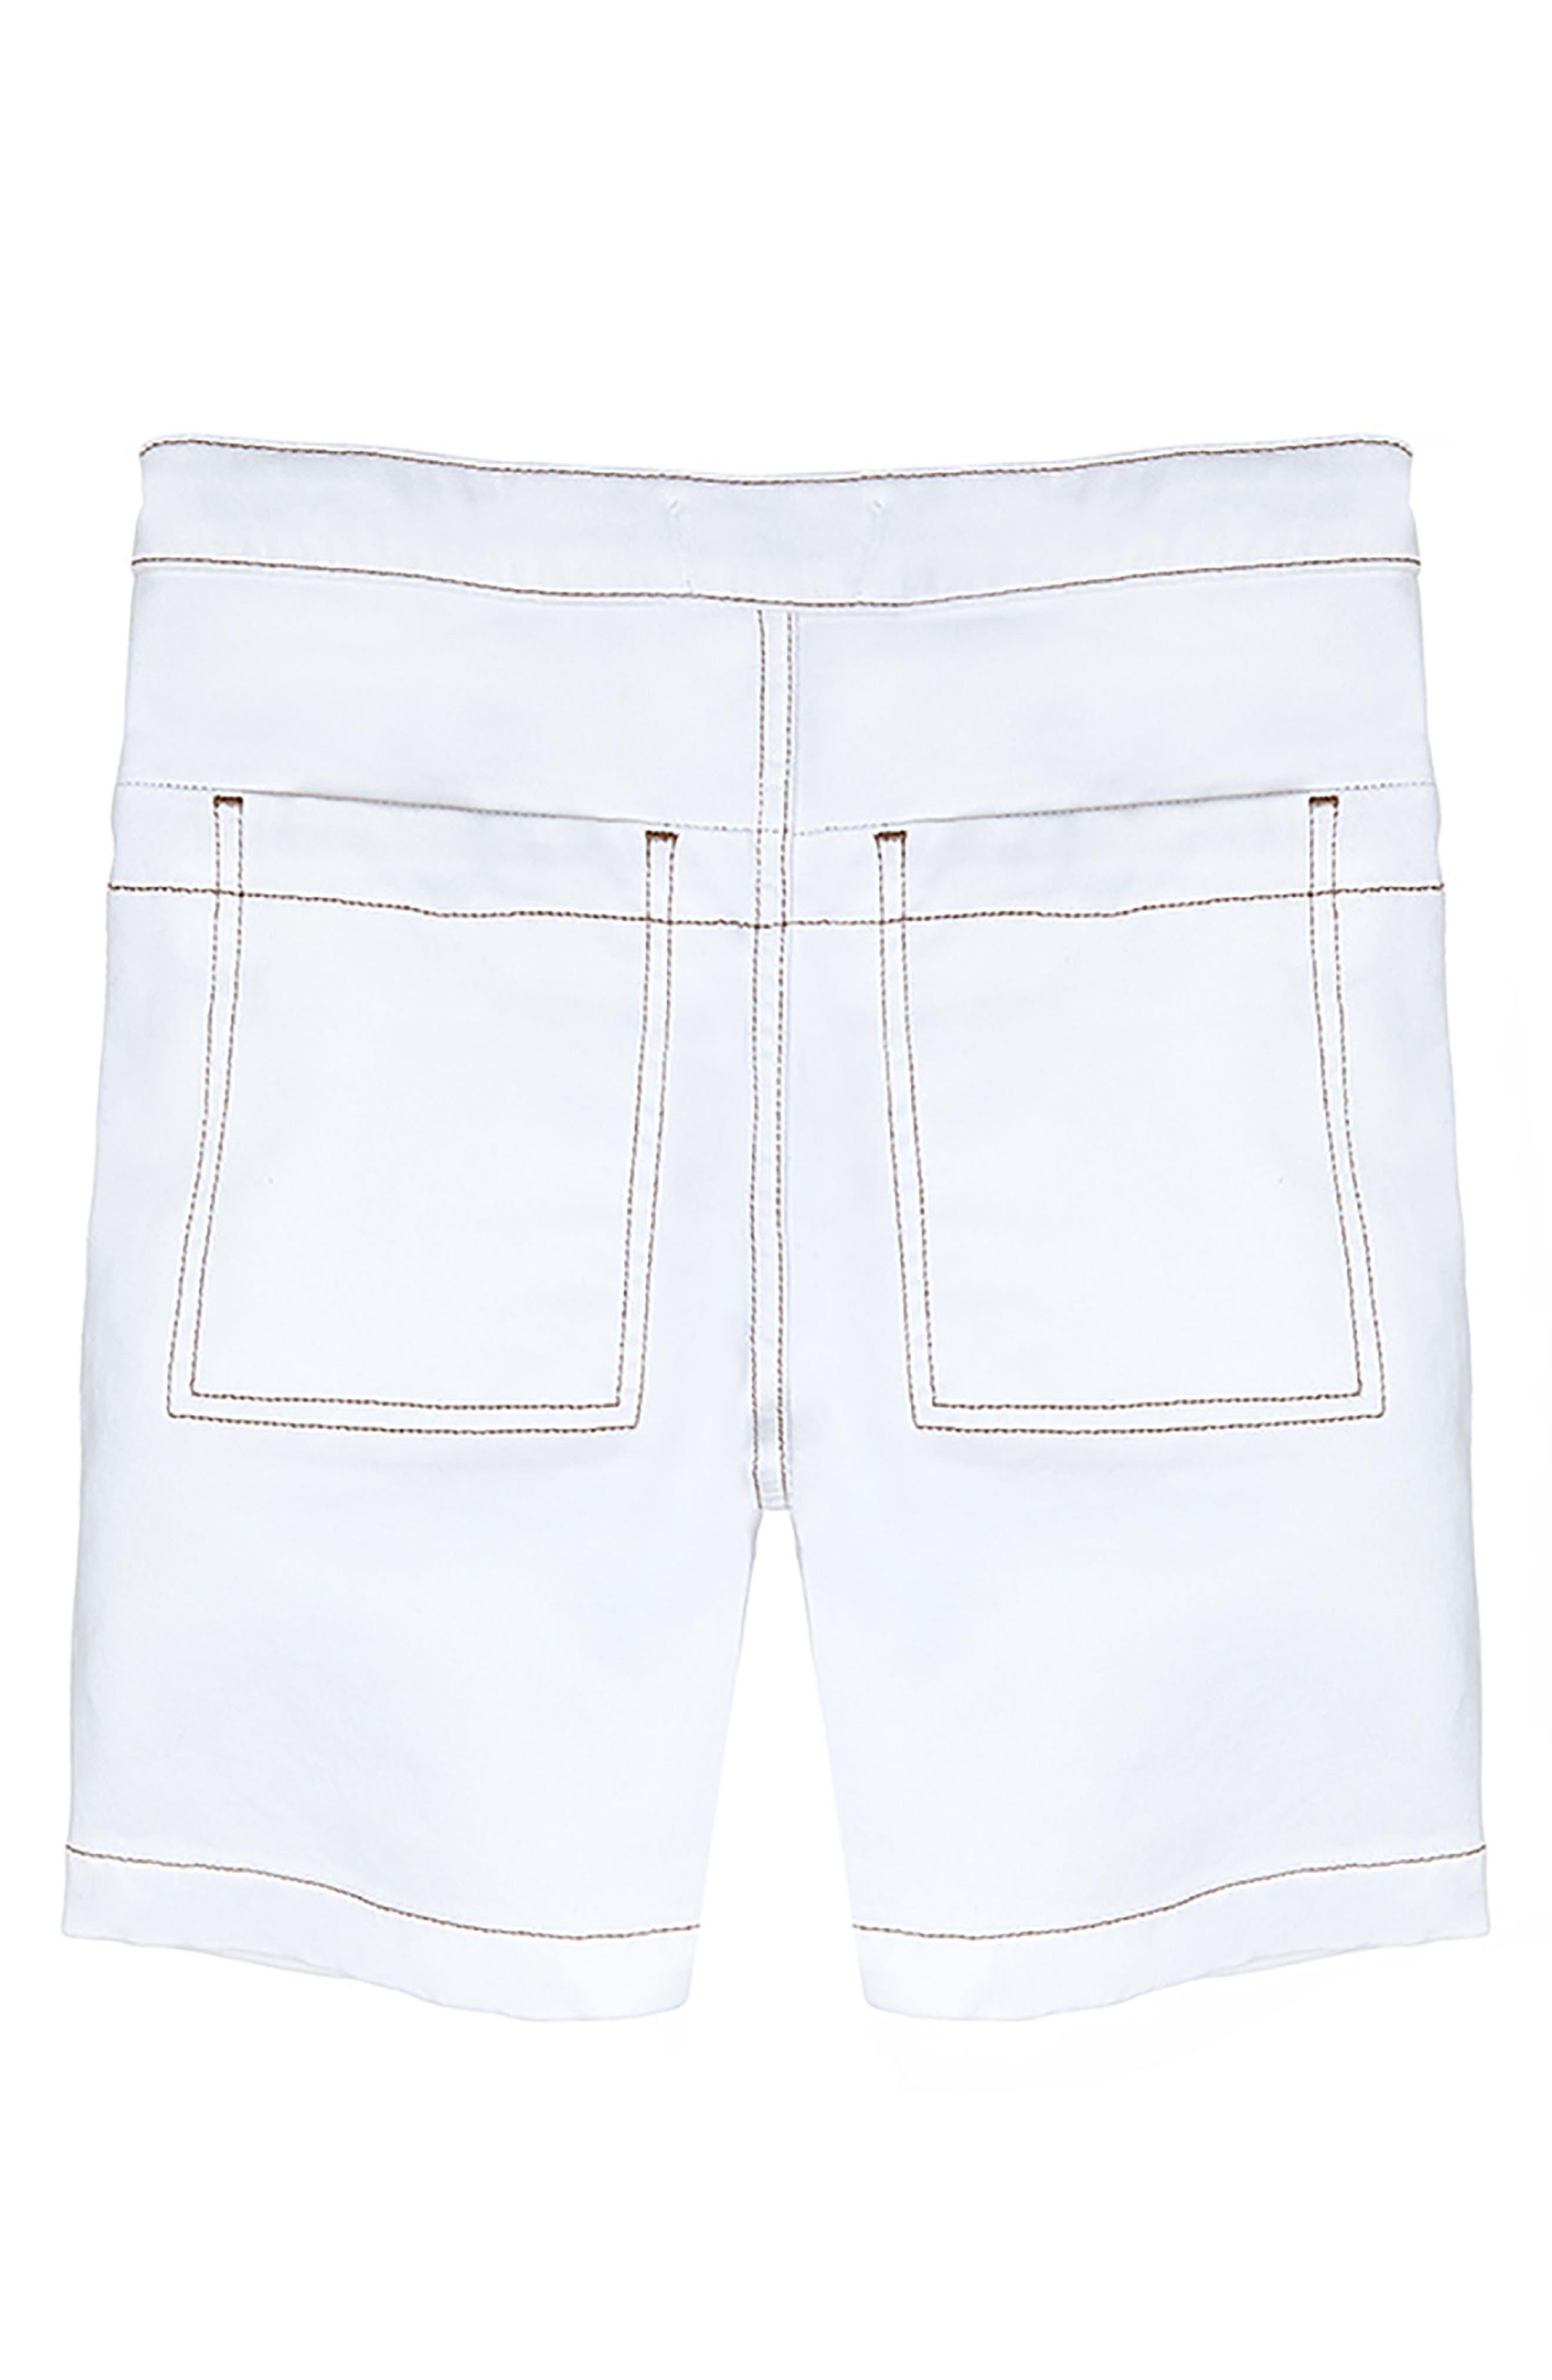 Jax Utility Shorts,                             Alternate thumbnail 2, color,                             Indiana